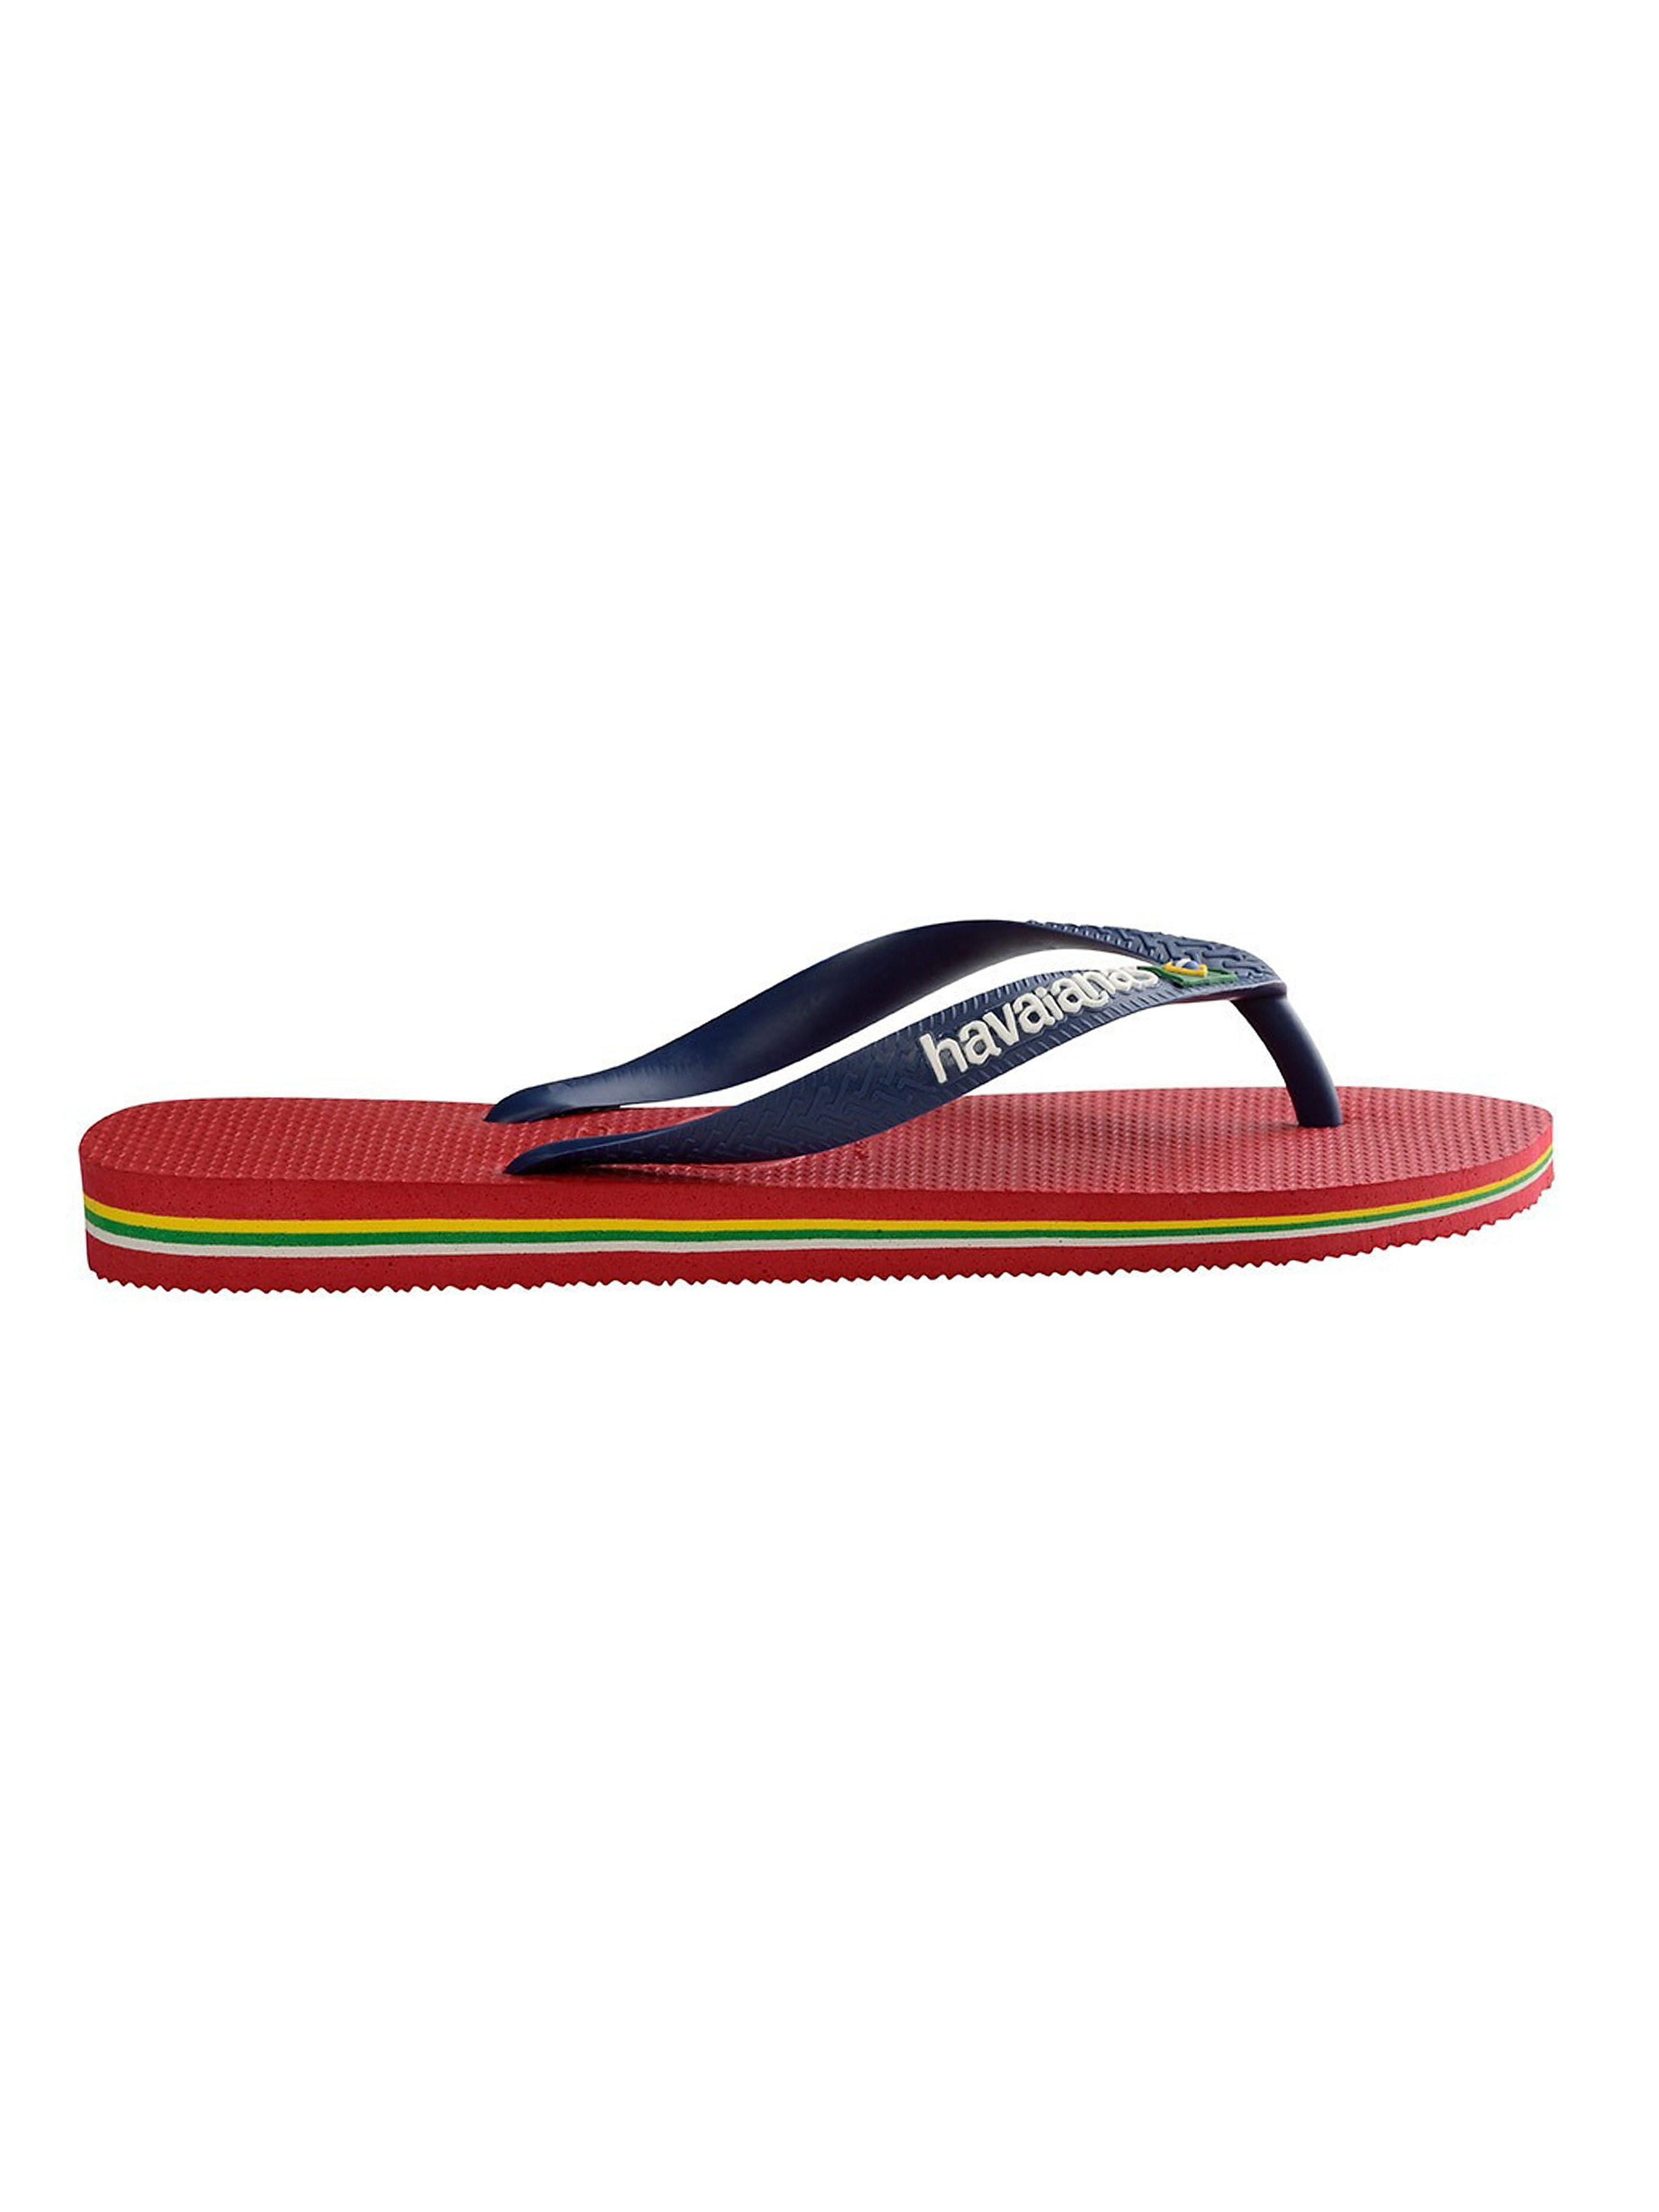 Havaianas Men's Brazil Logo Flip Flops - Red